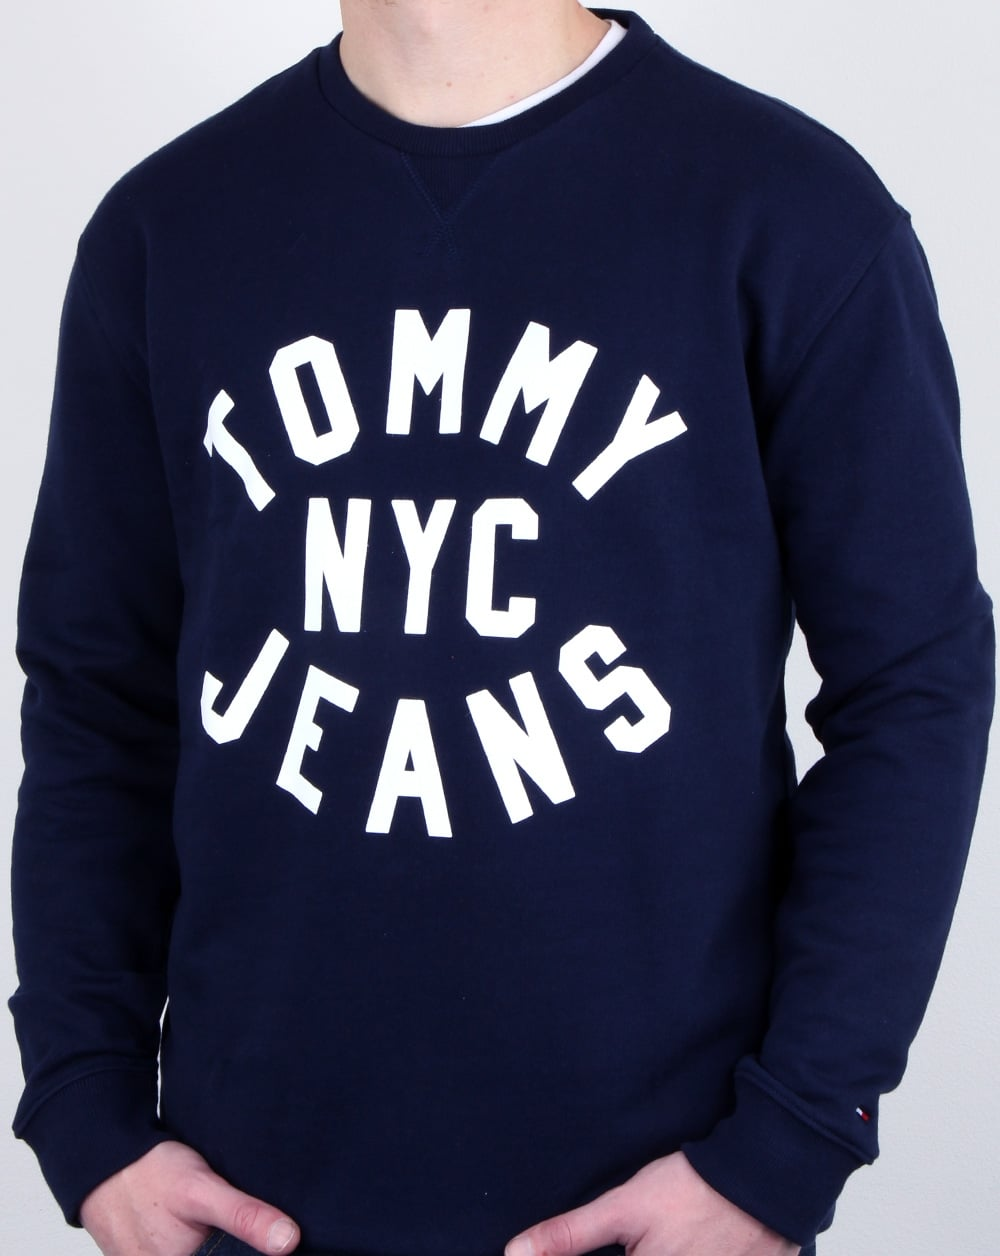 c336d01a Tommy Hilfiger NYC Logo Sweatshirt Navy, Mens, Cotton, Crew Neck